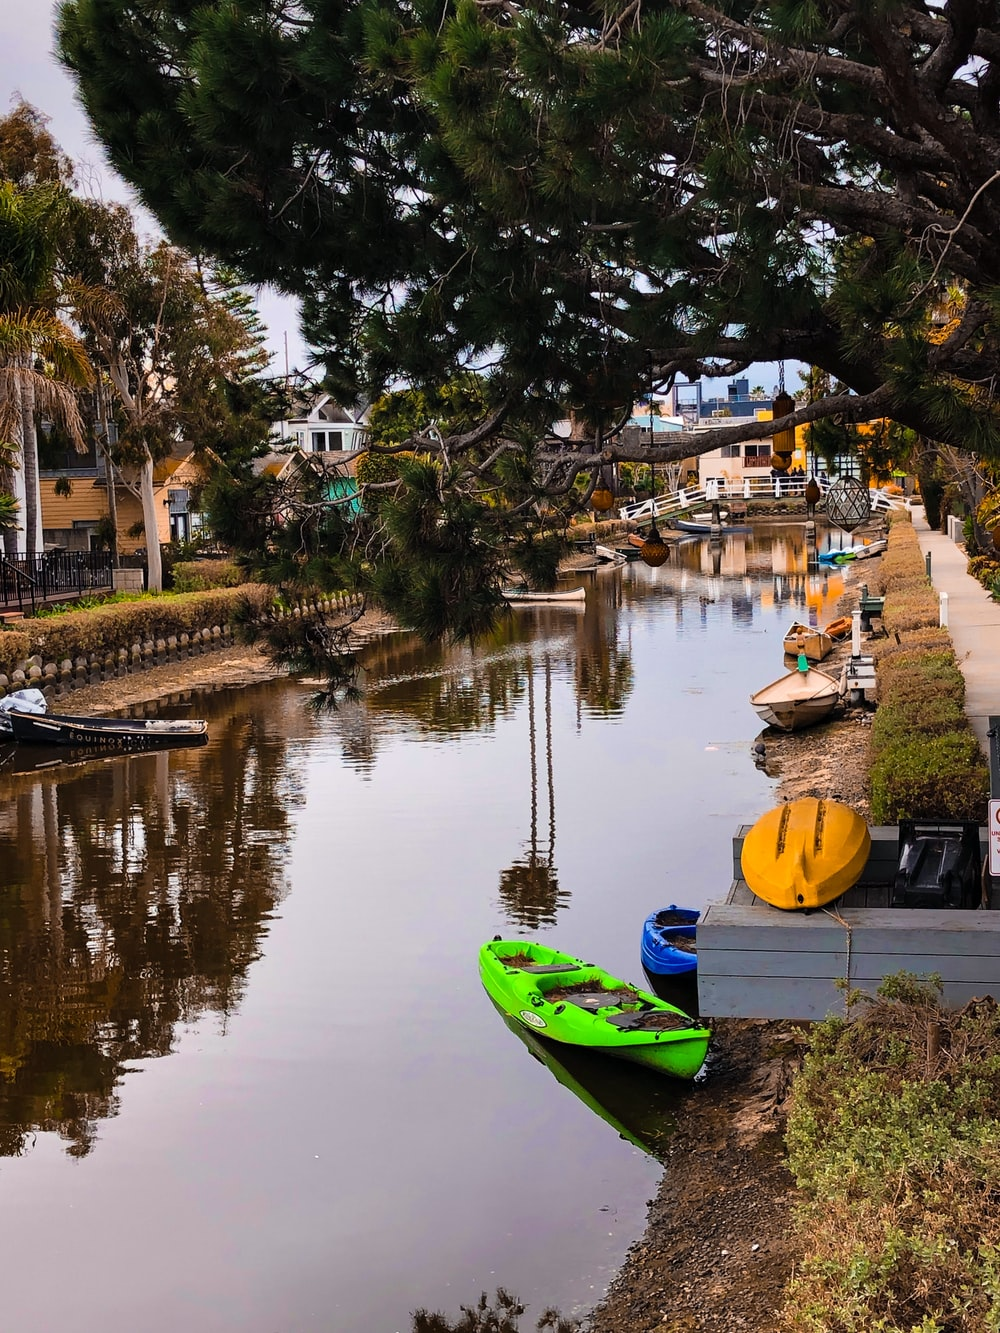 green kayak parked near tree